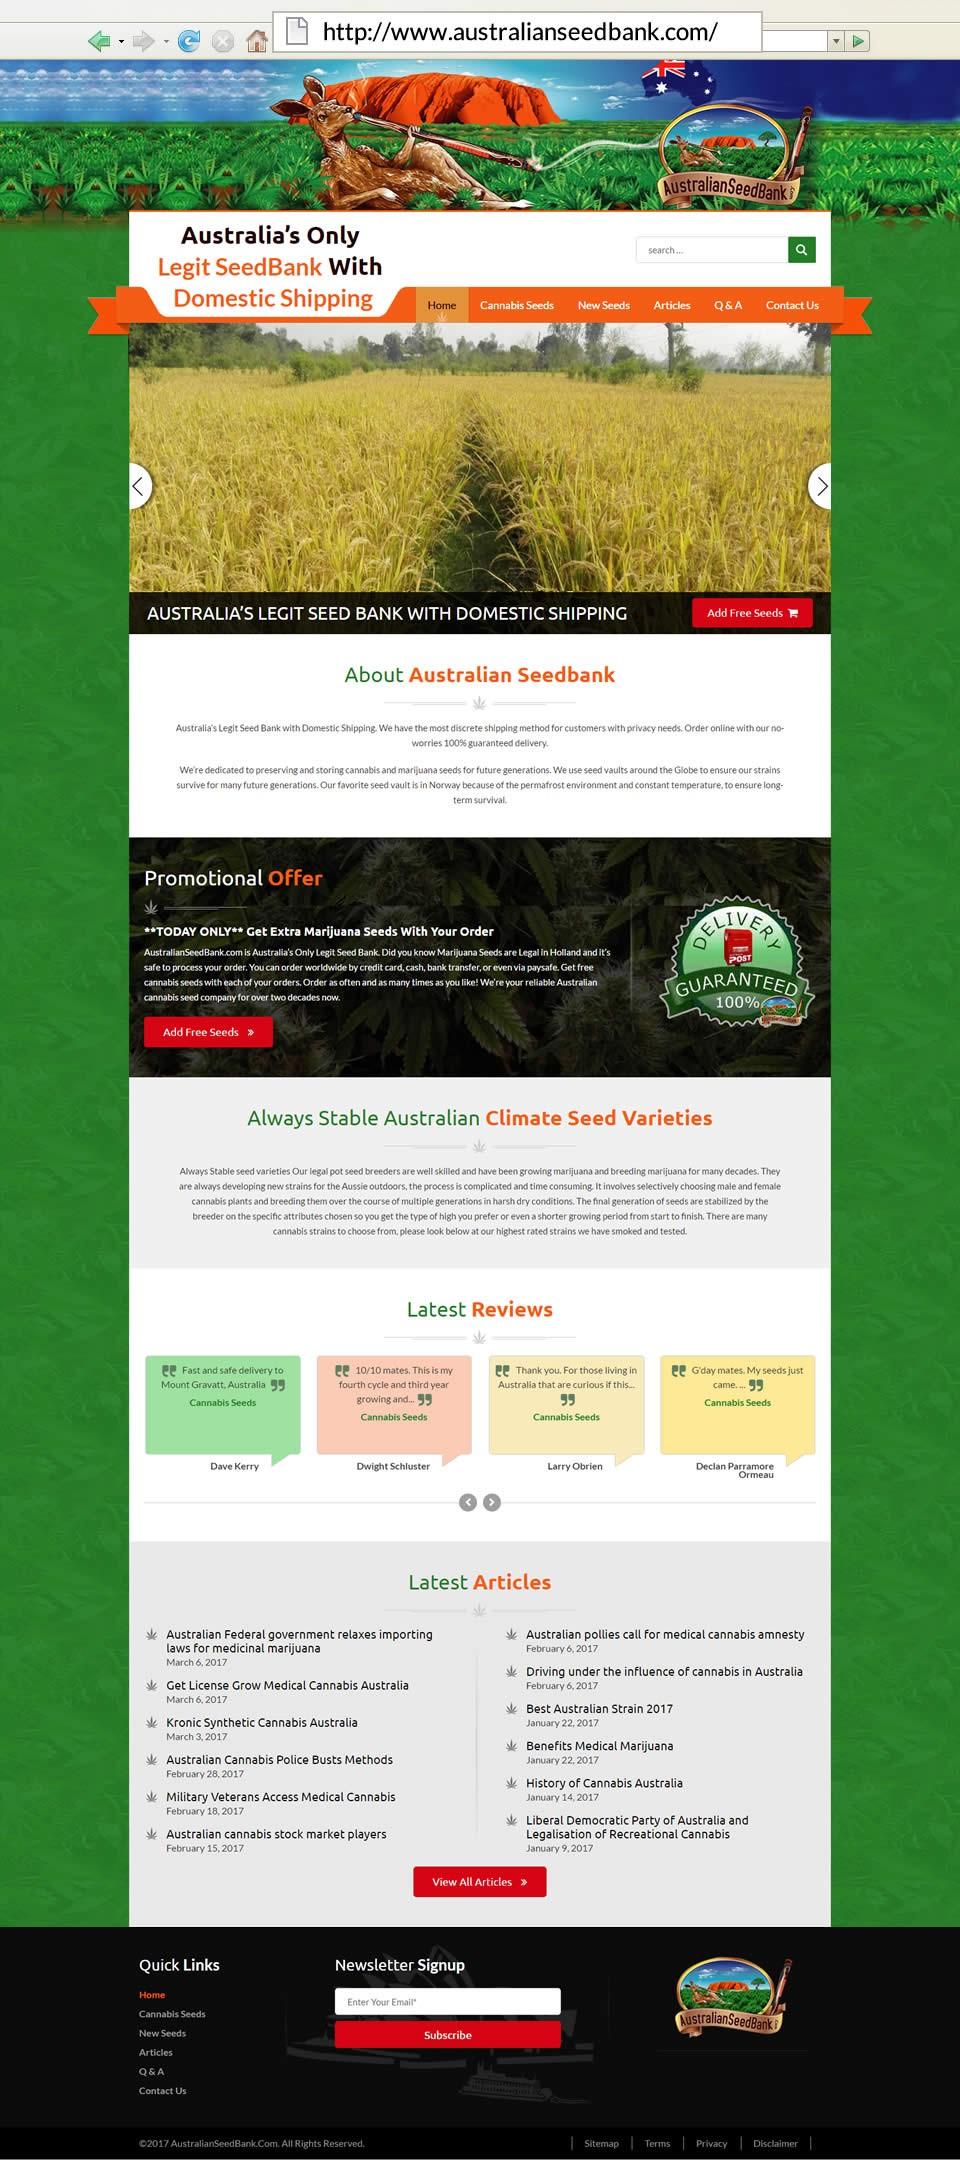 http://www.smartinfosys.net/50184/australian-seedbank.jpg